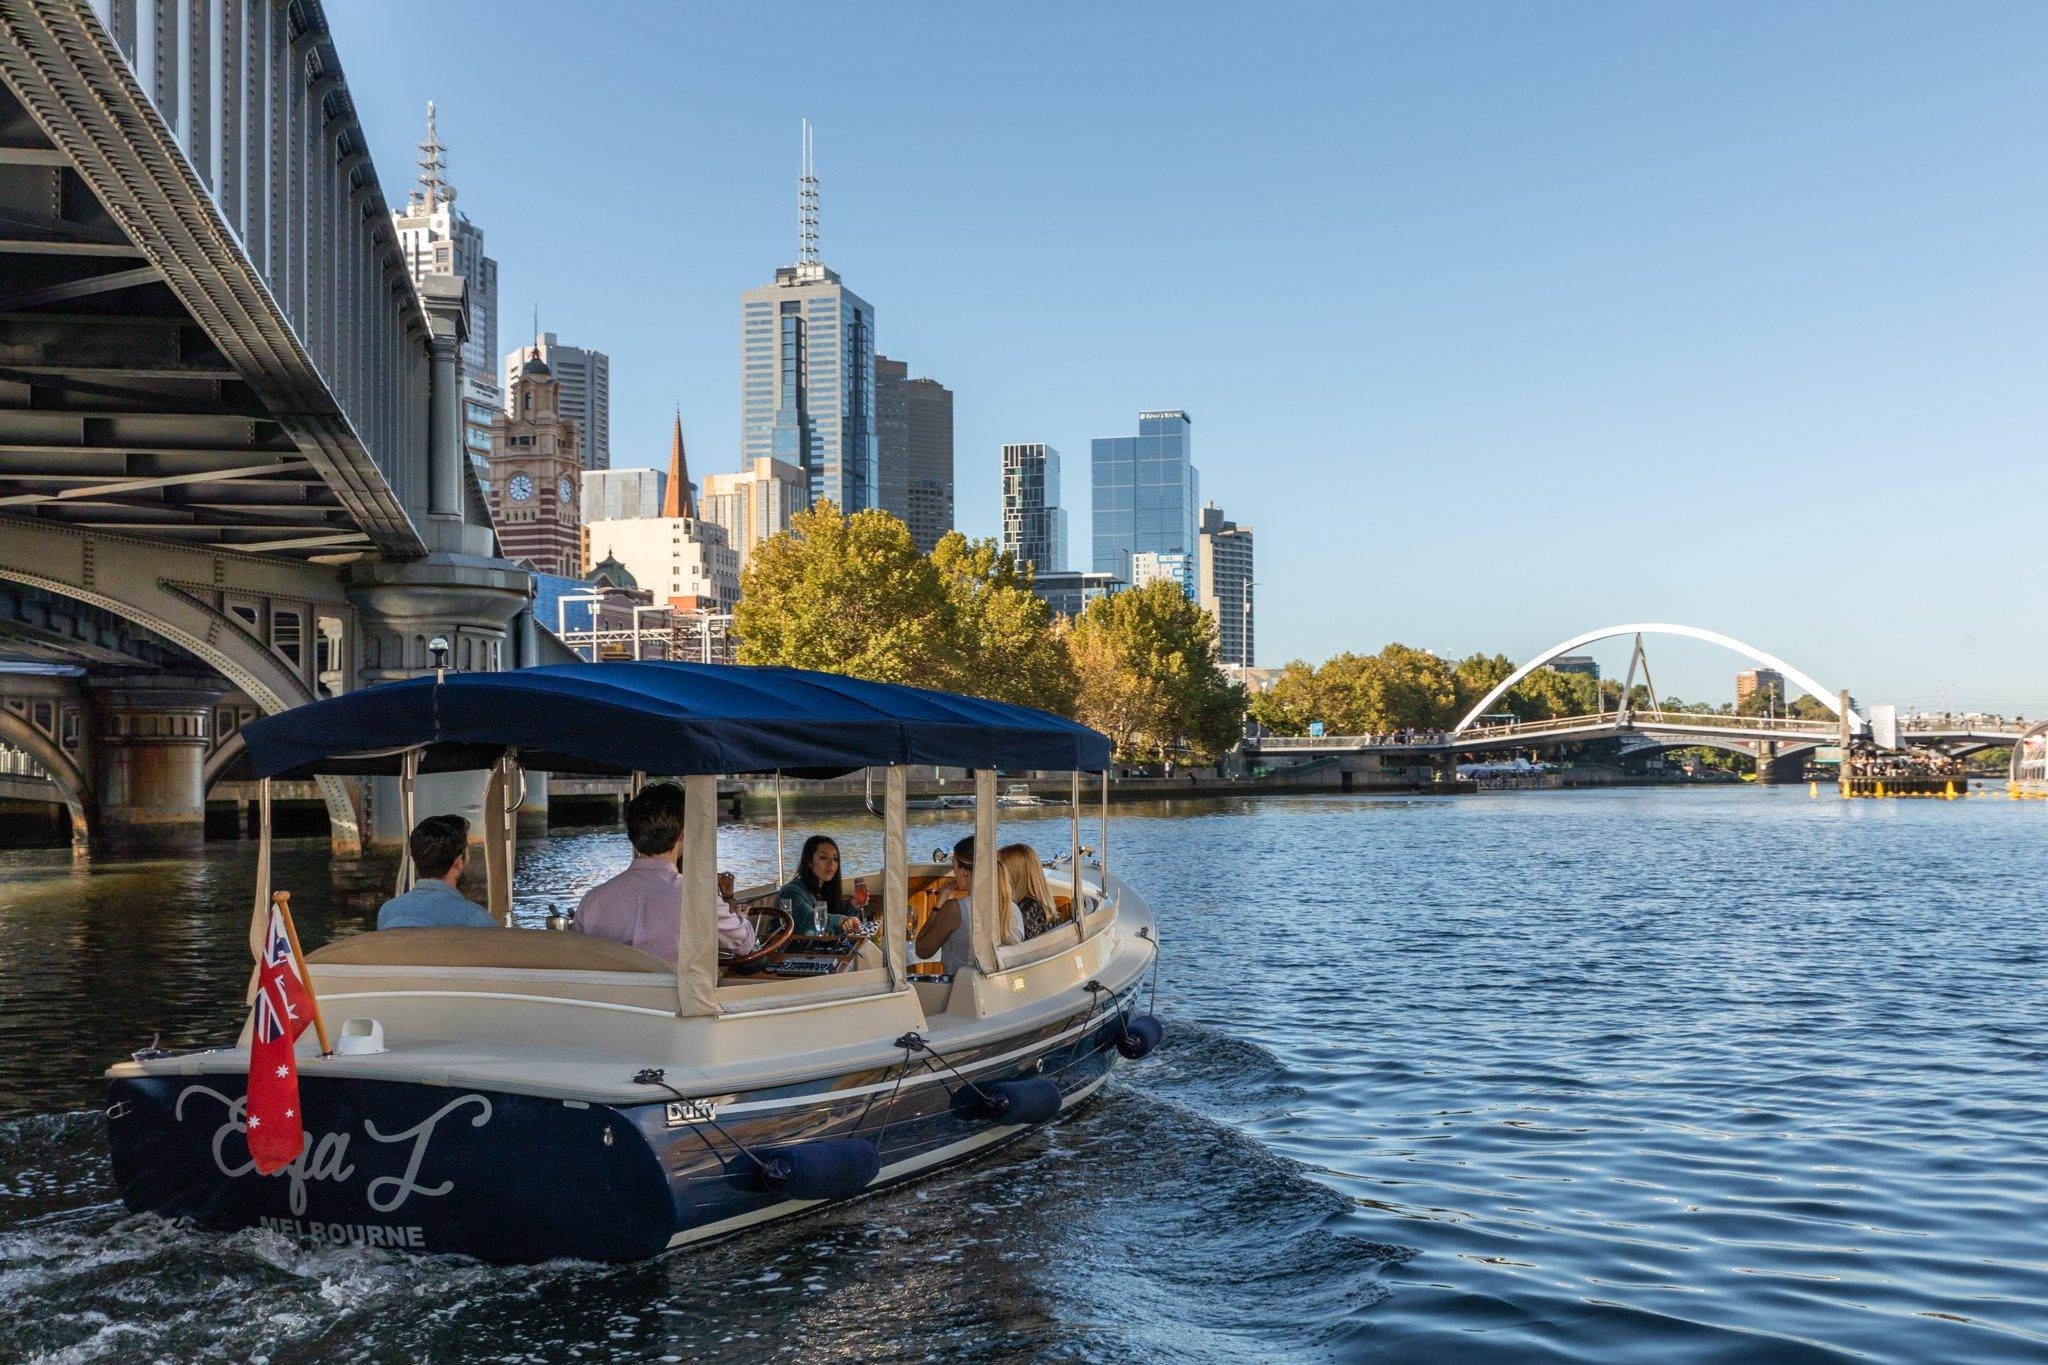 Self Drive Boat Hire Melbourne | Self Drive Luxury Boat Hire